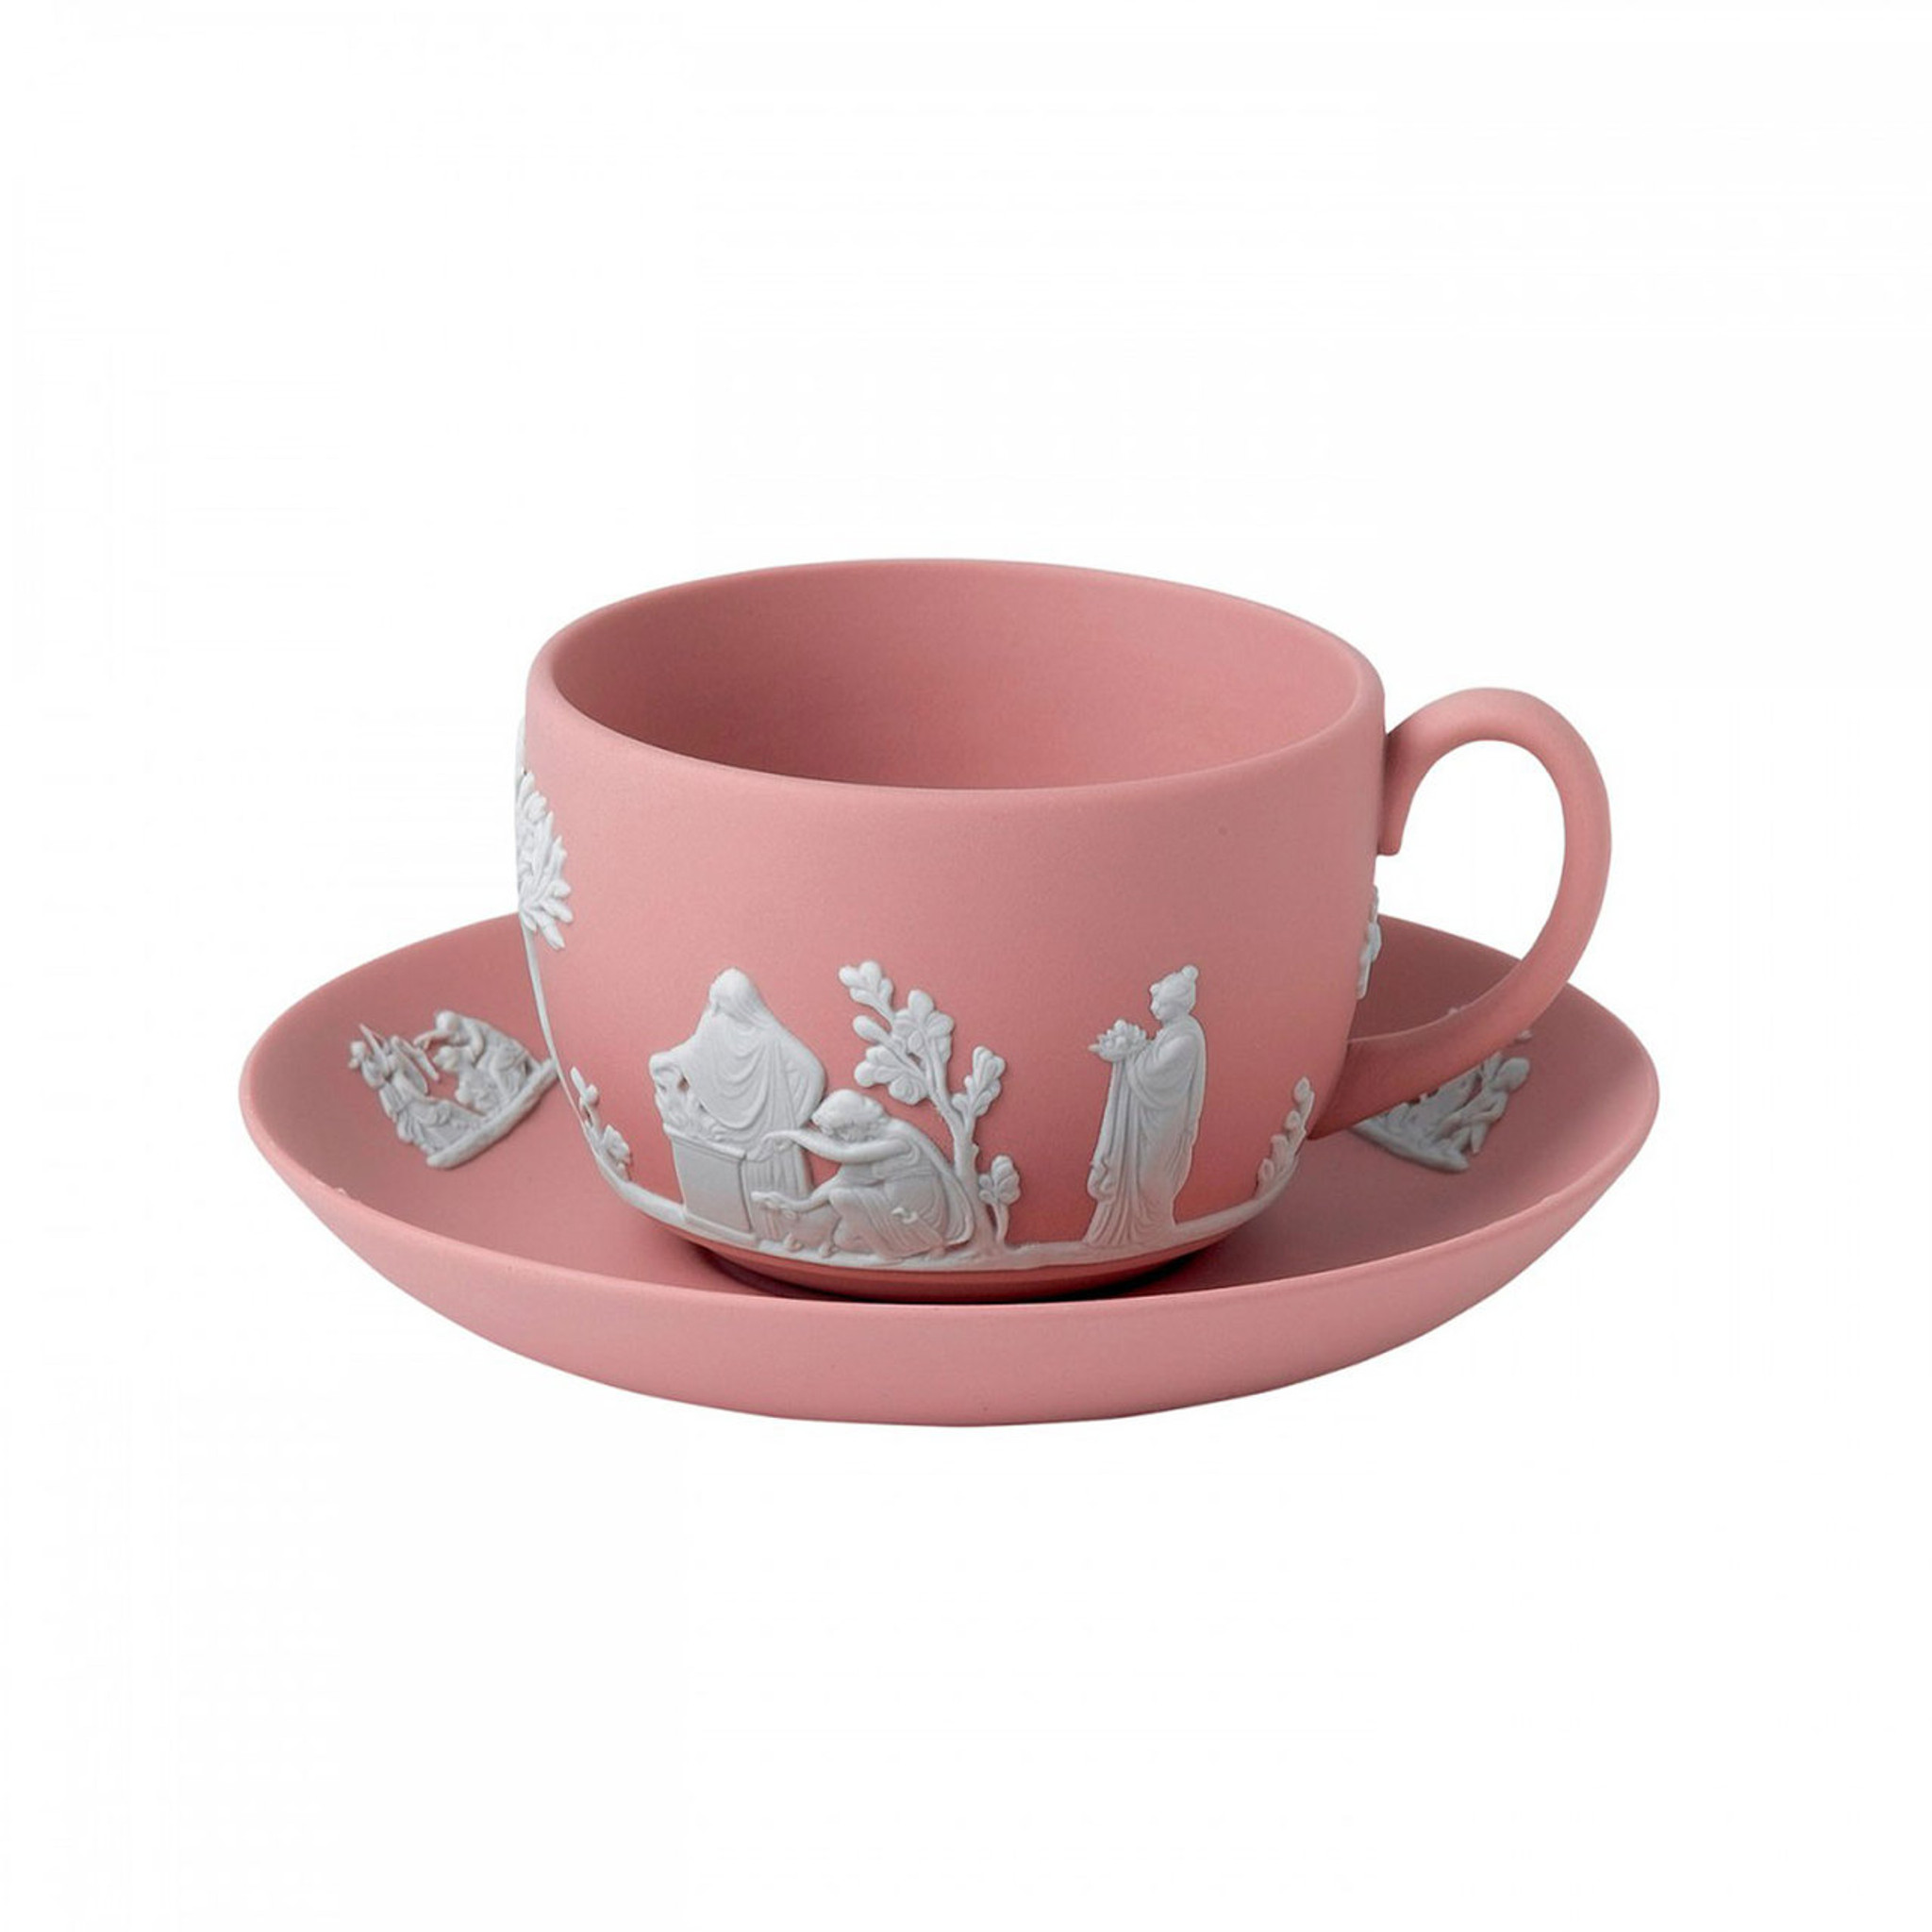 Y/öL Pastel Pink Coffee Mugs Tea Cups Set of 4 White Rim Stoneware Home Office 370ml